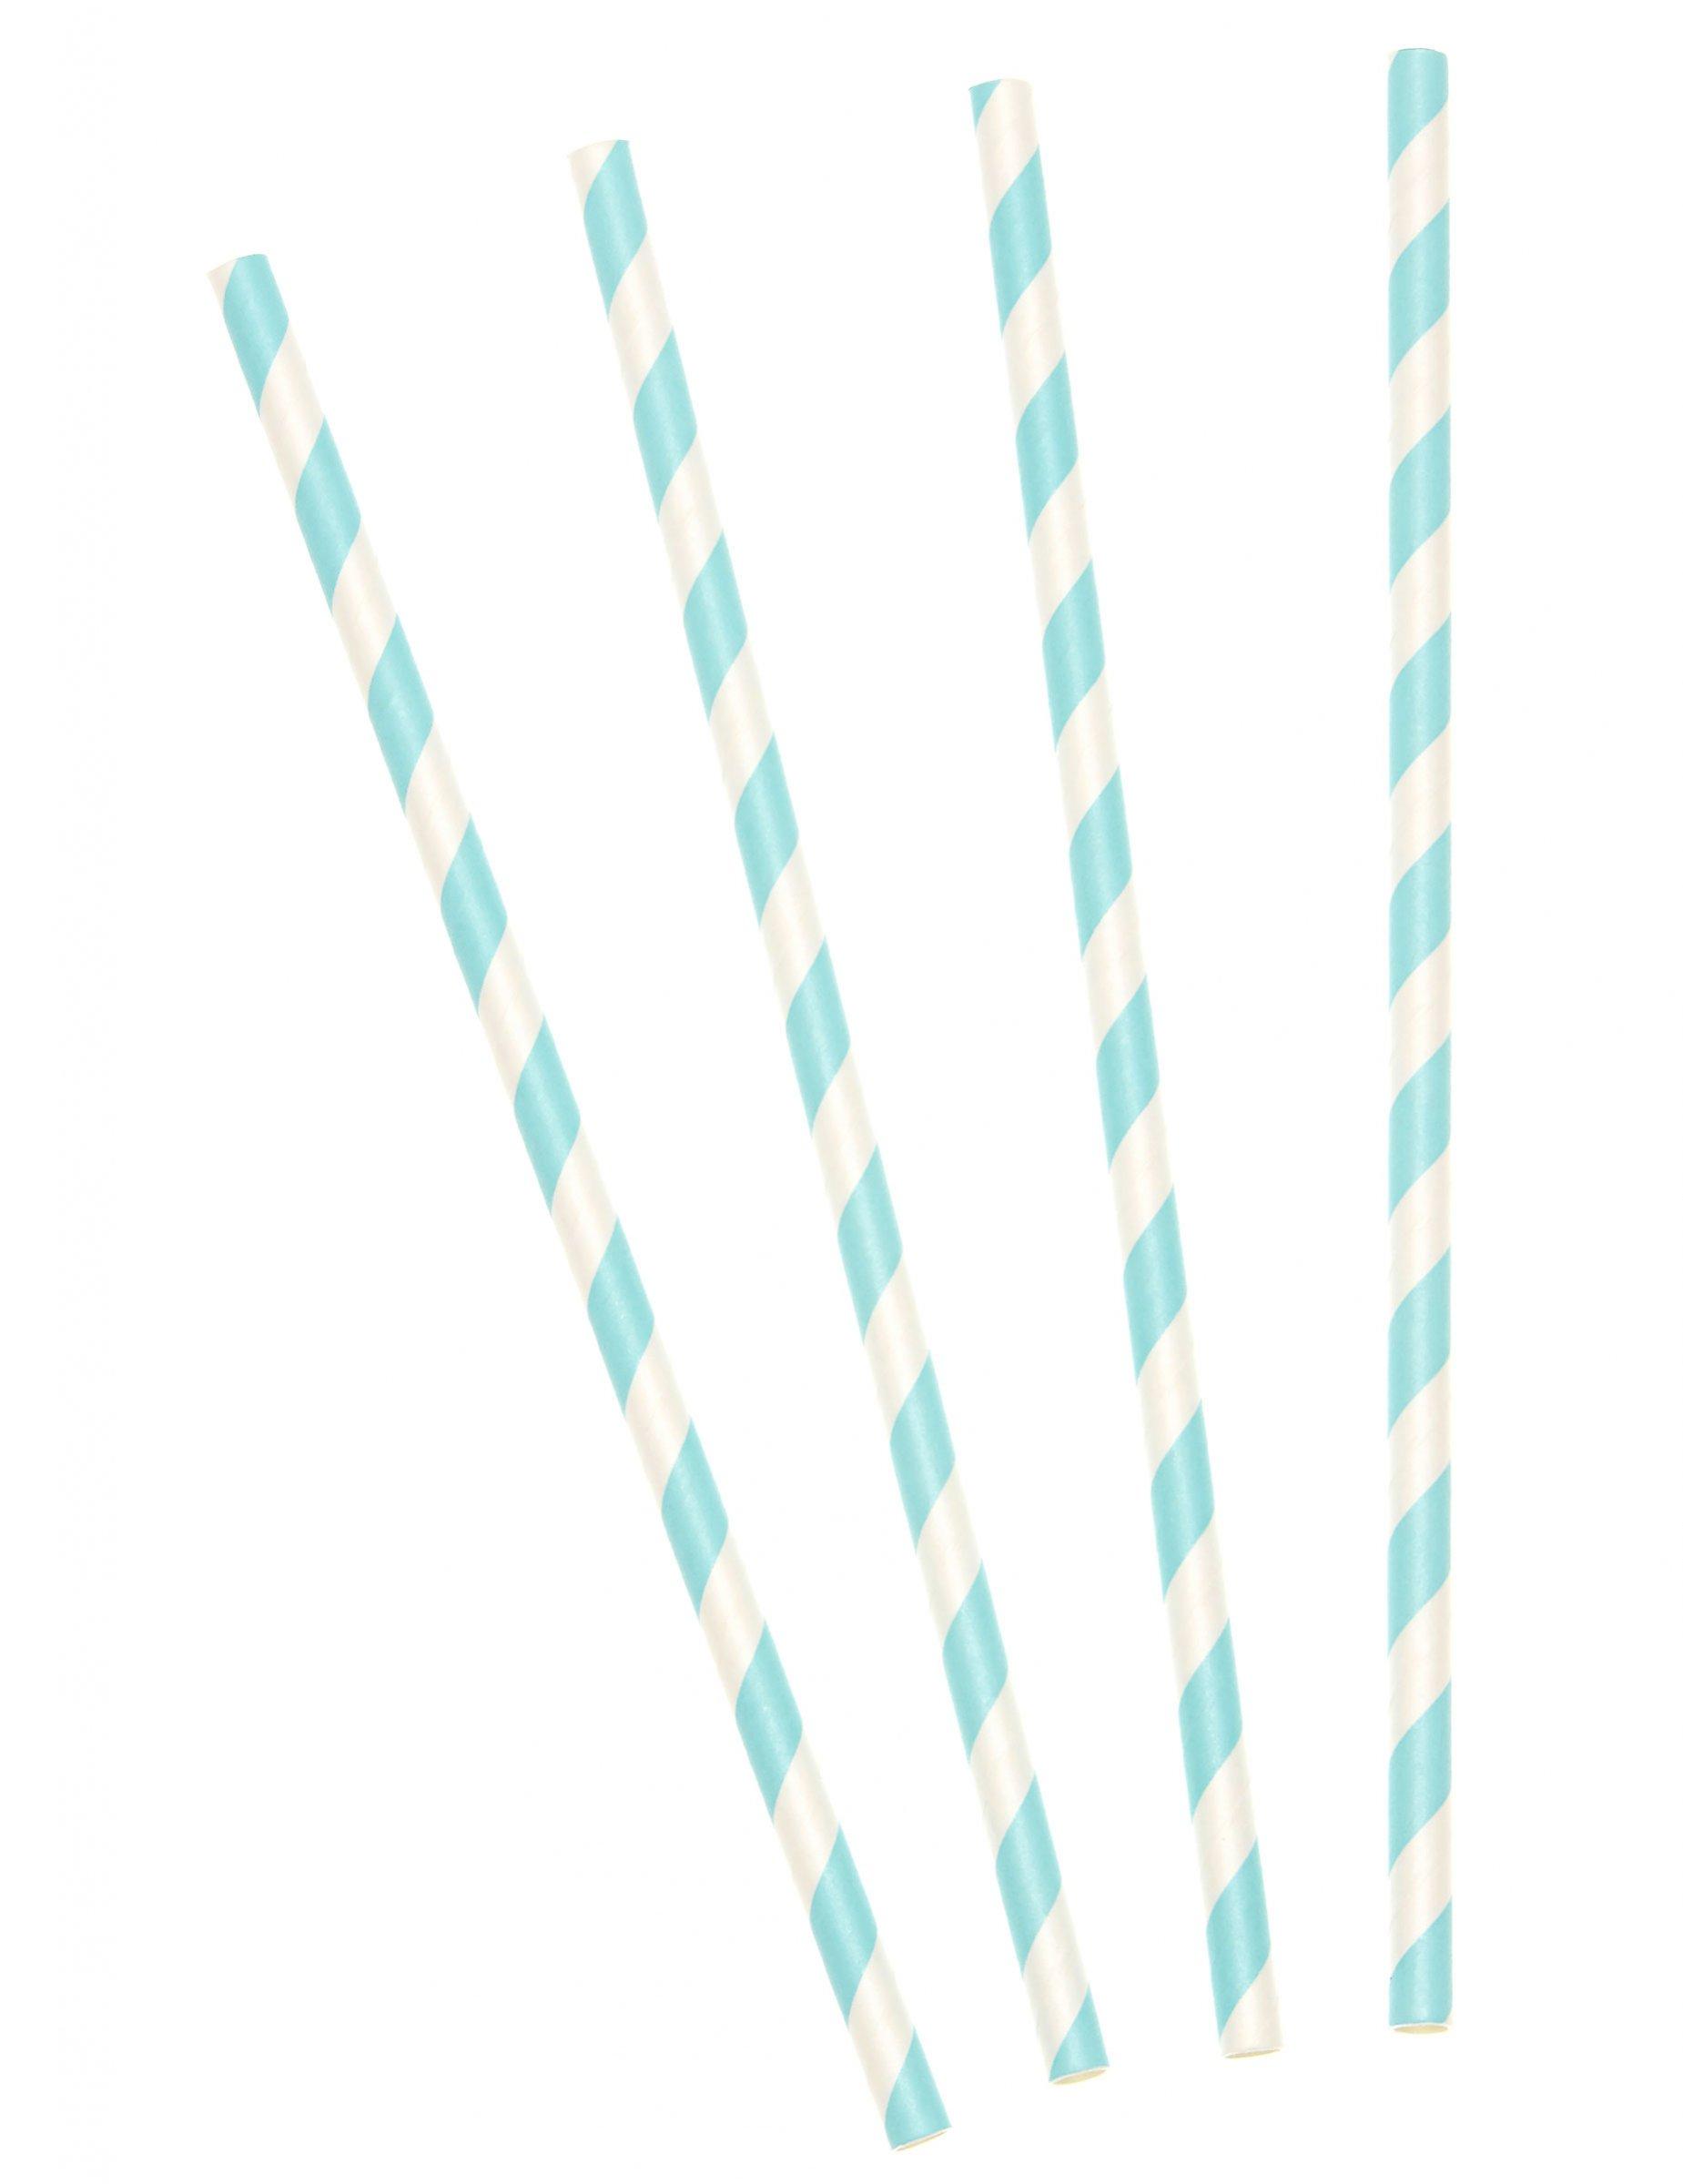 10 Strohhalme himmelblau gestreift